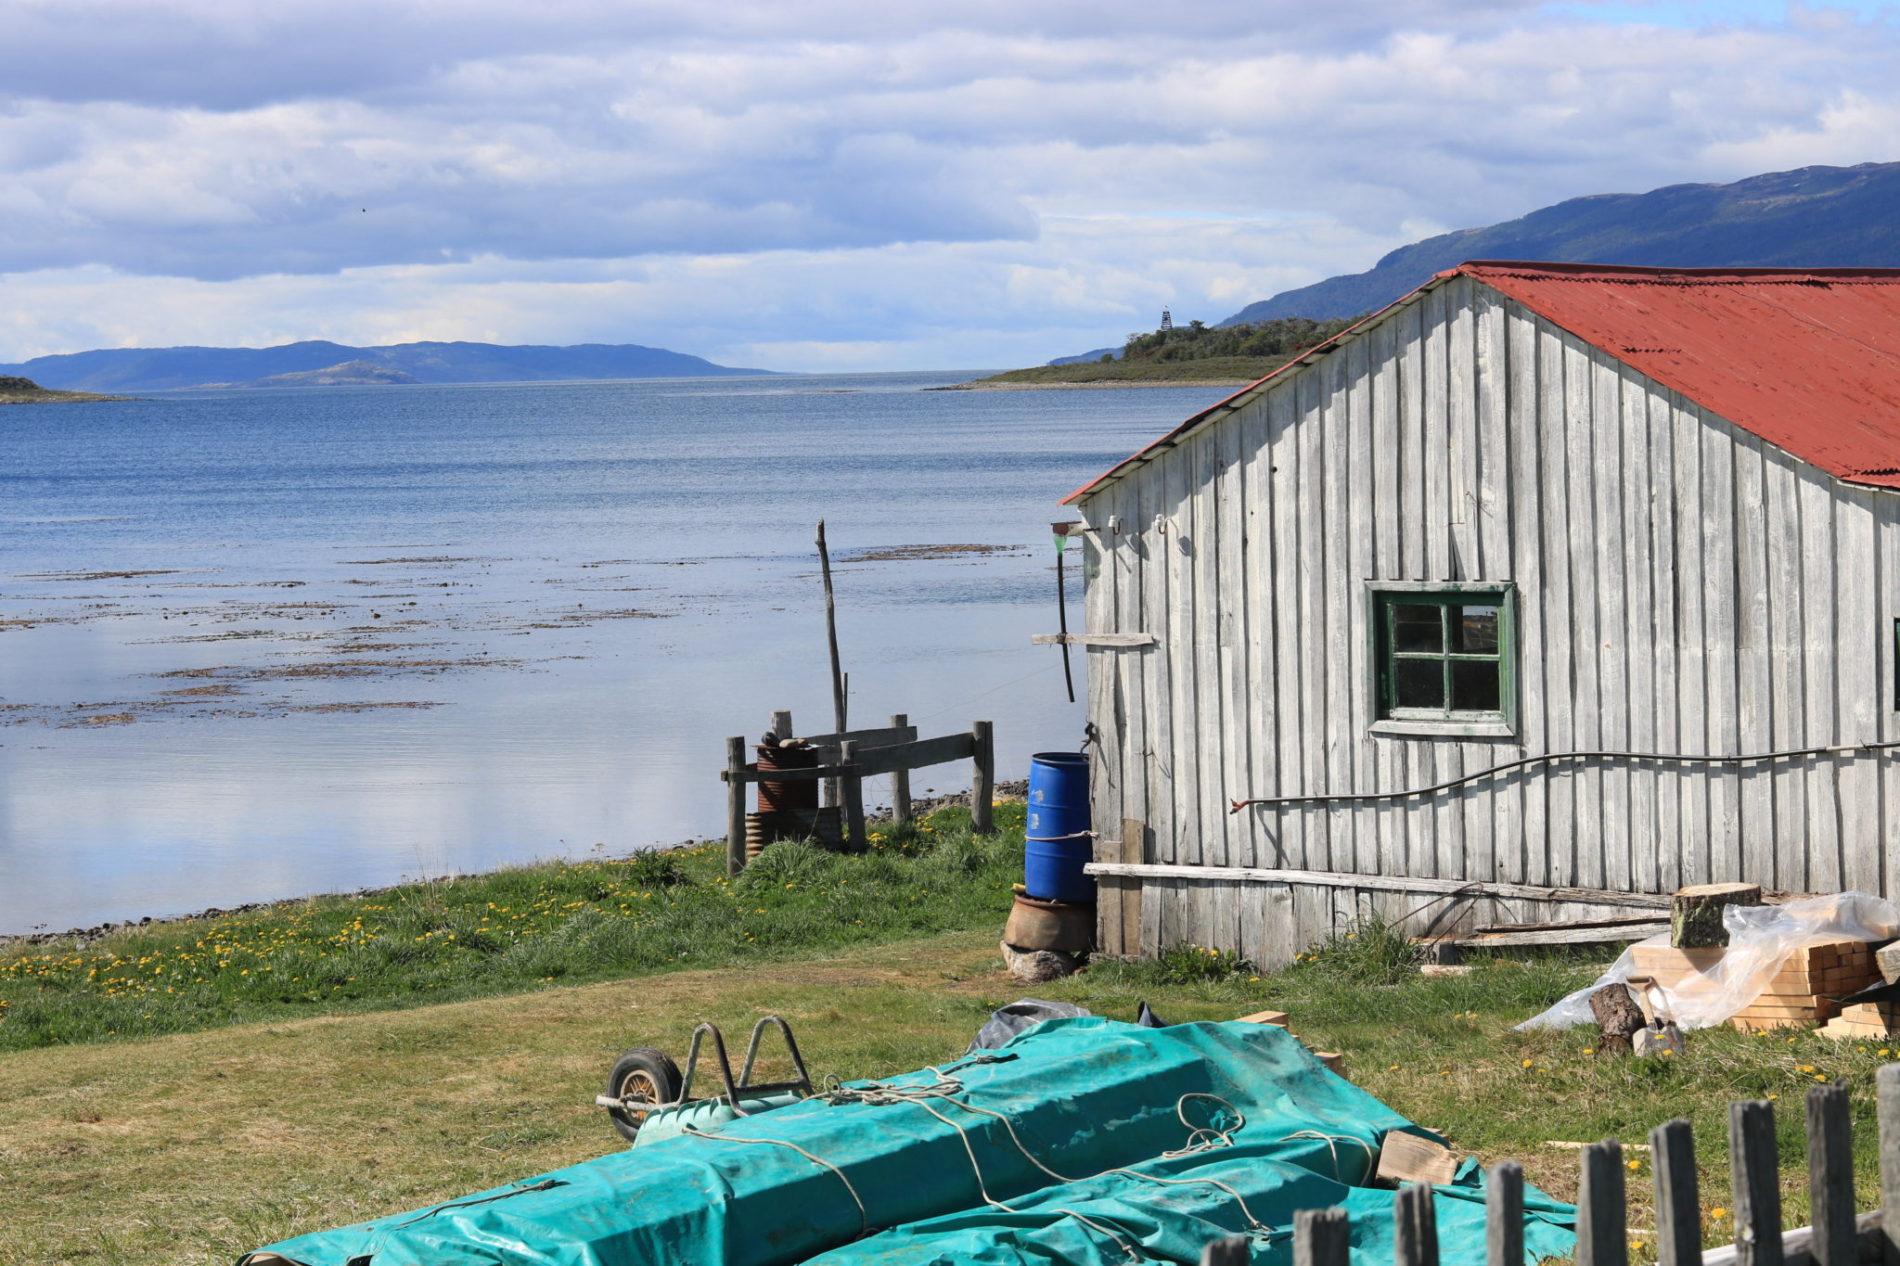 Blog voyage Ushuaïa Terre de feu